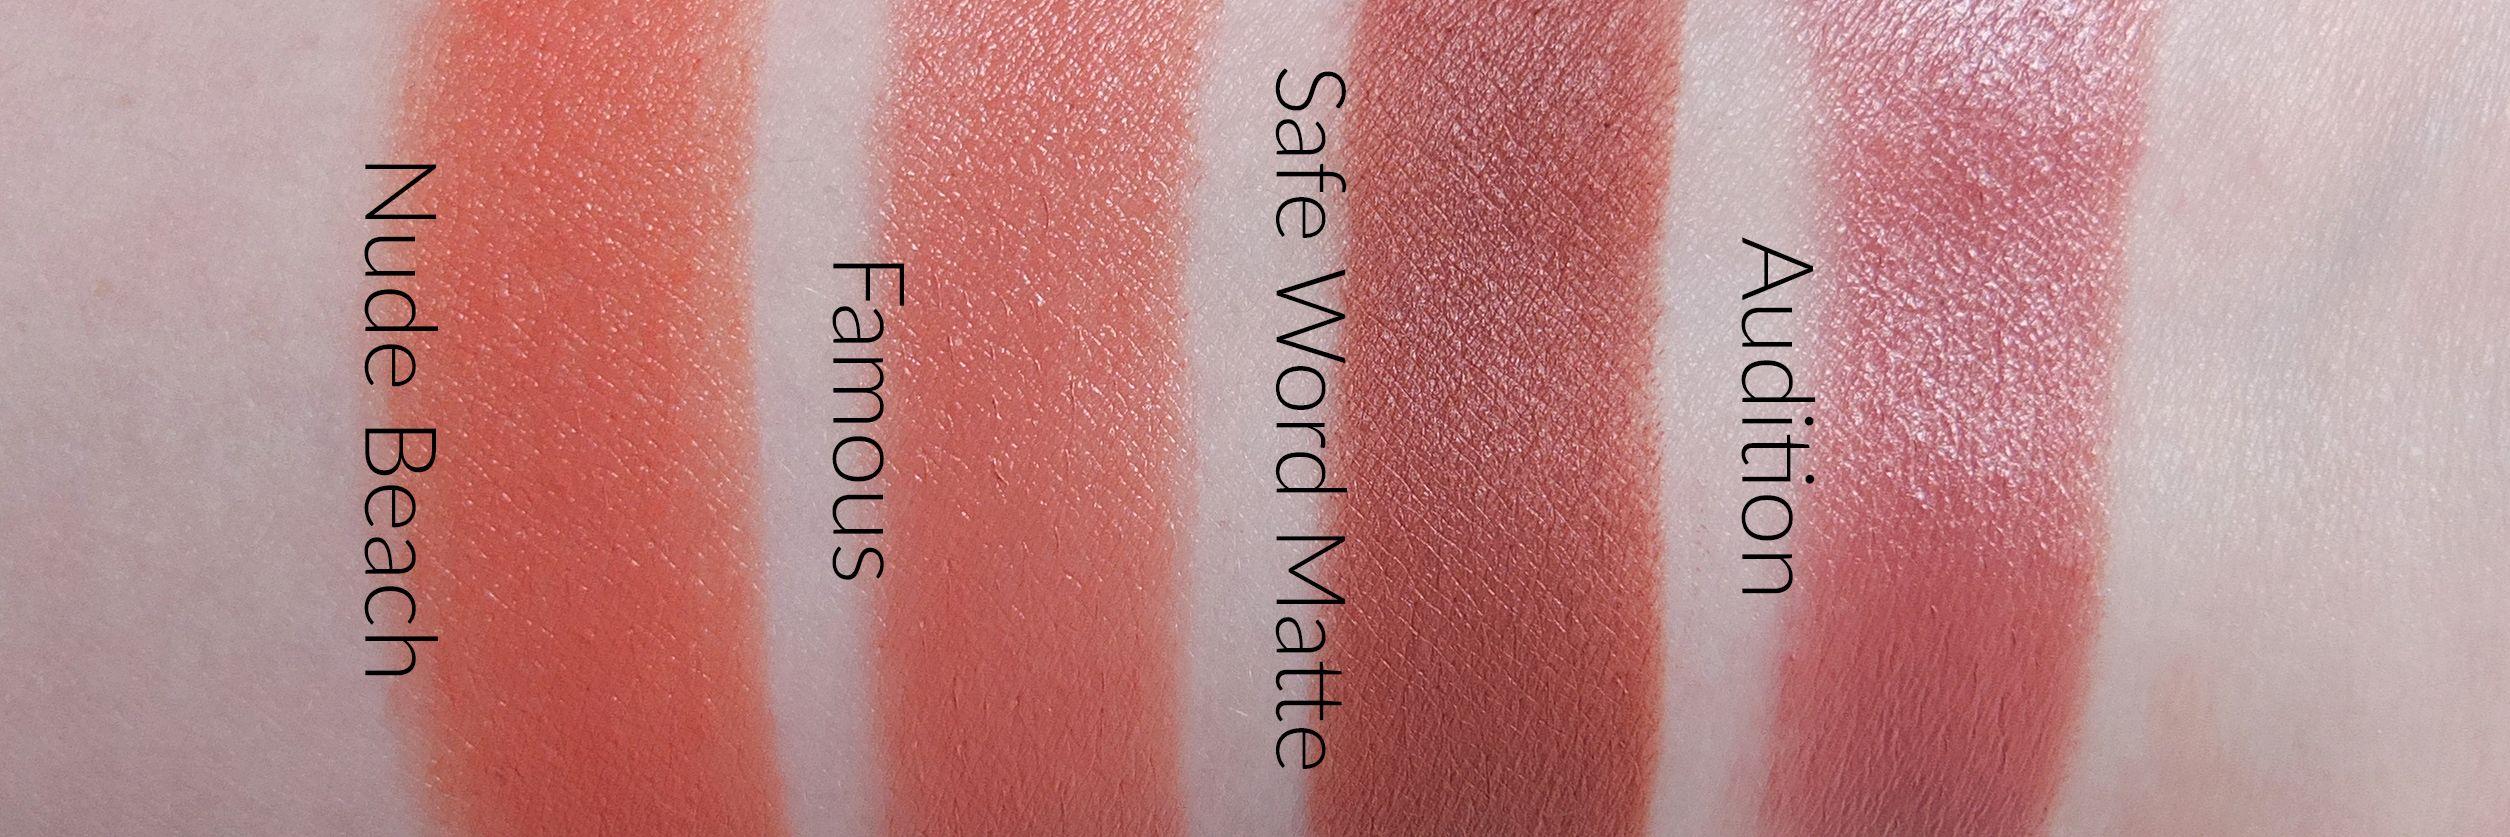 Be Legendary Matte Lipstick Palette by Smashbox #9